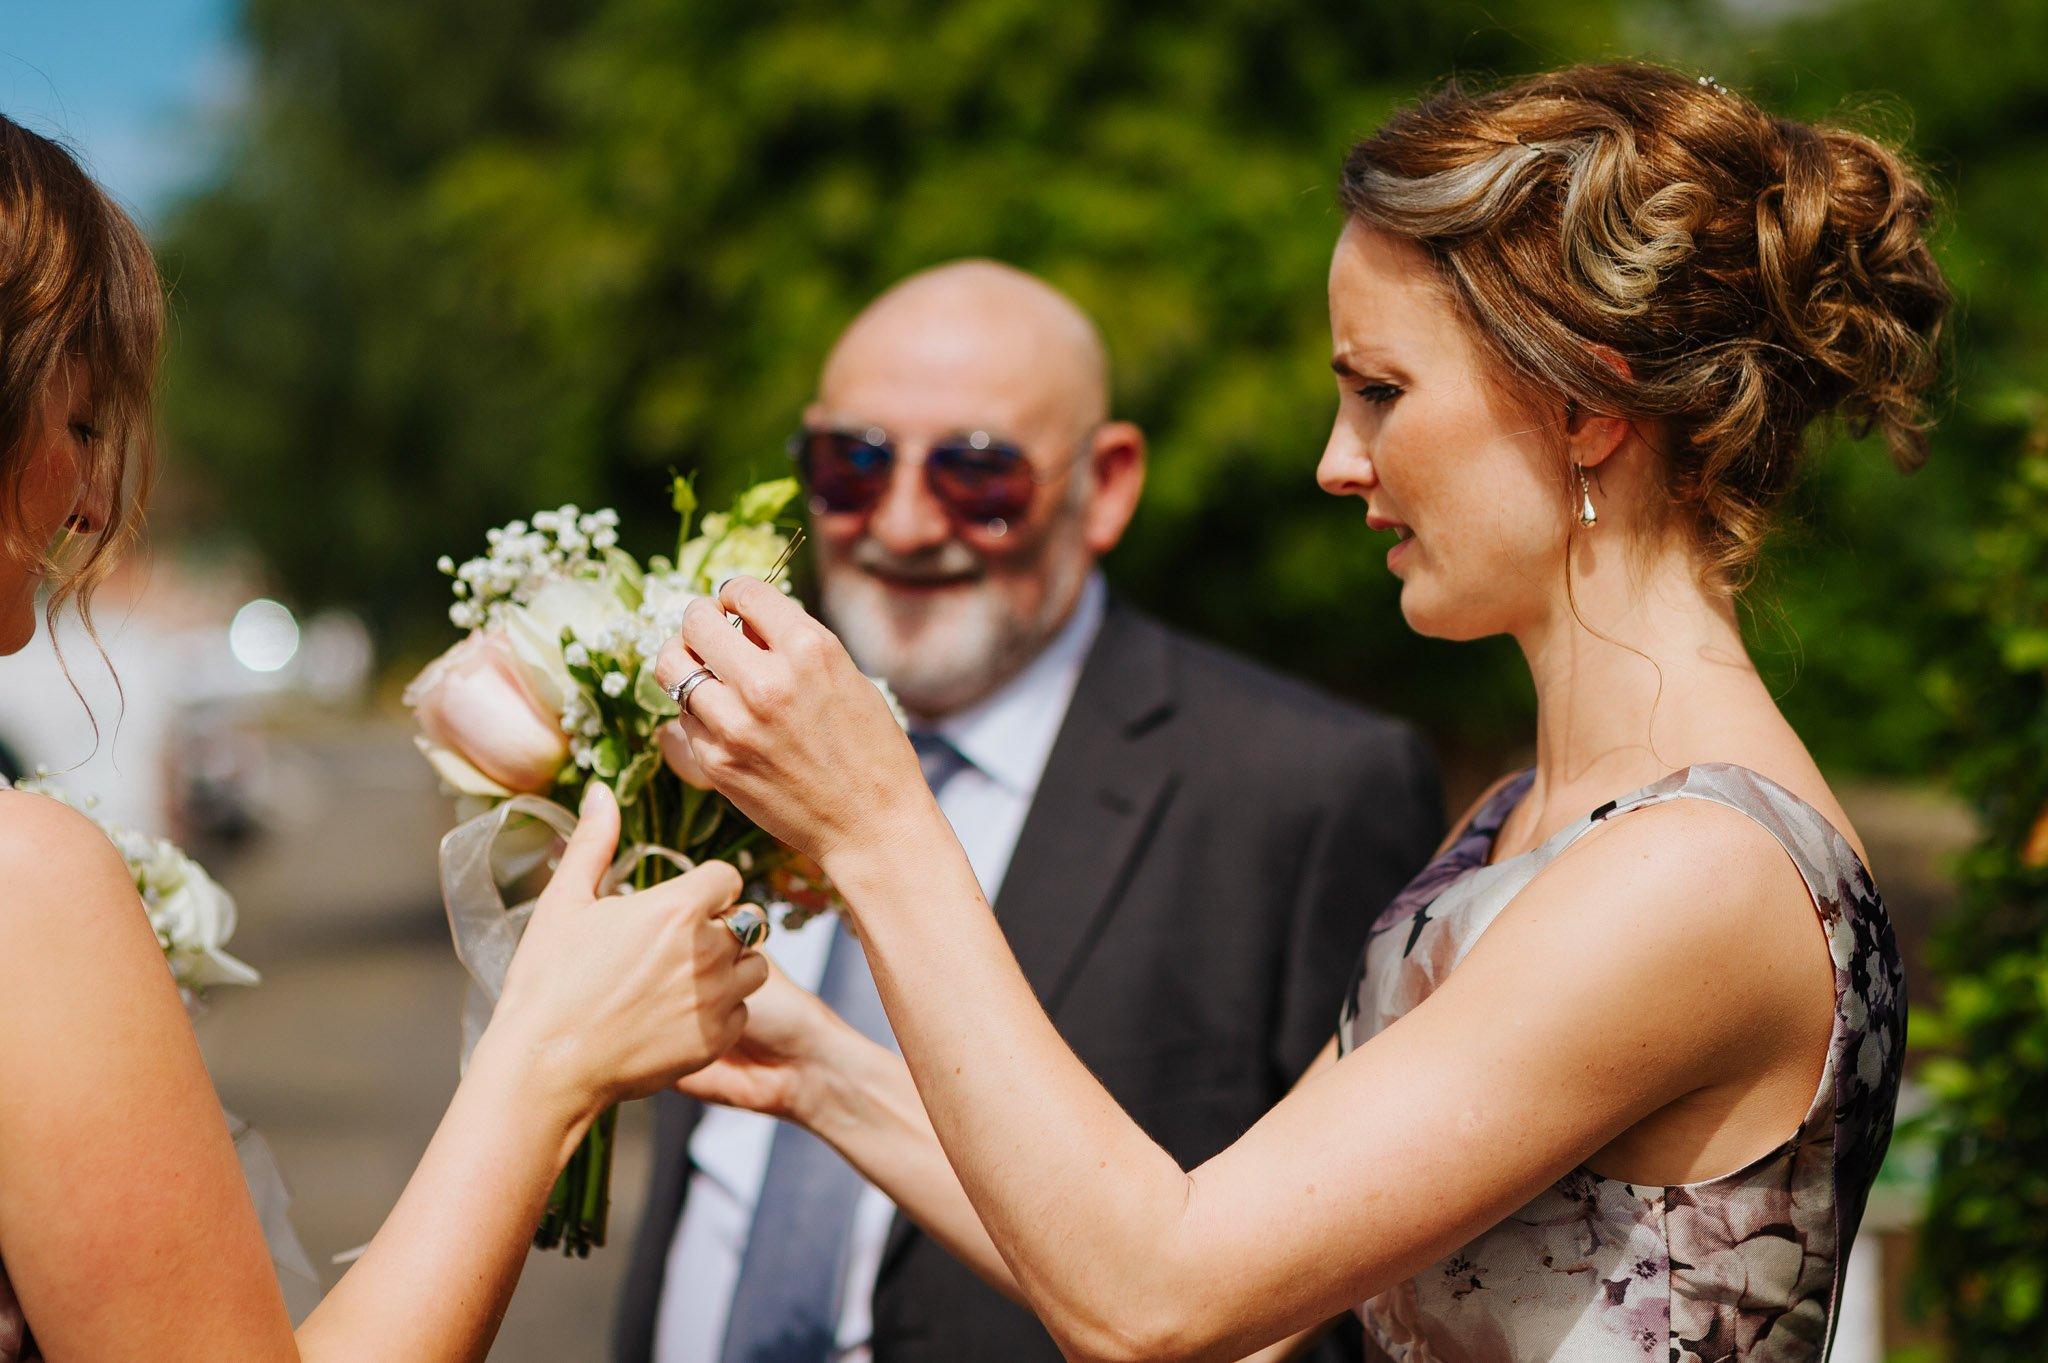 Georgina + Mike - Wedding photography in Malvern, Worcestershire 12